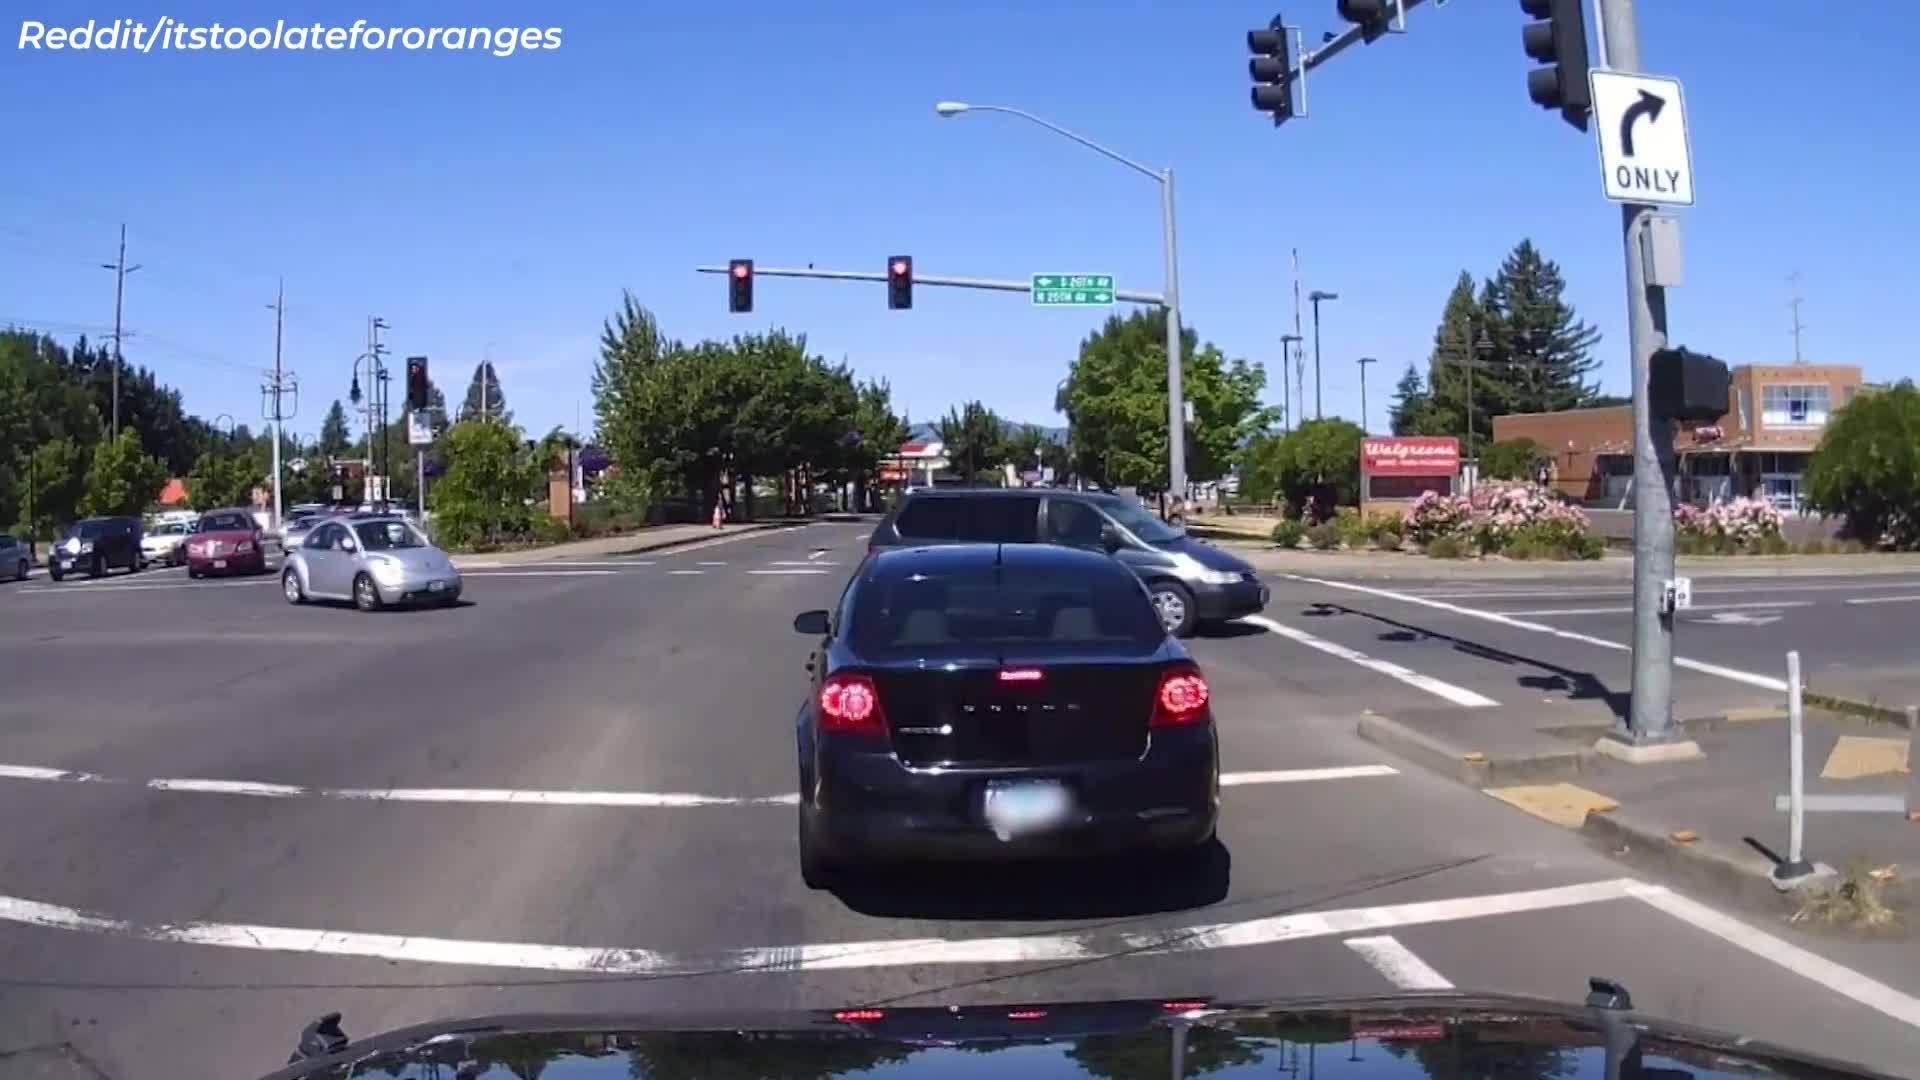 Watch__Dash_cam_shows_bad_Portland_drive_6_20190612202631-842137445